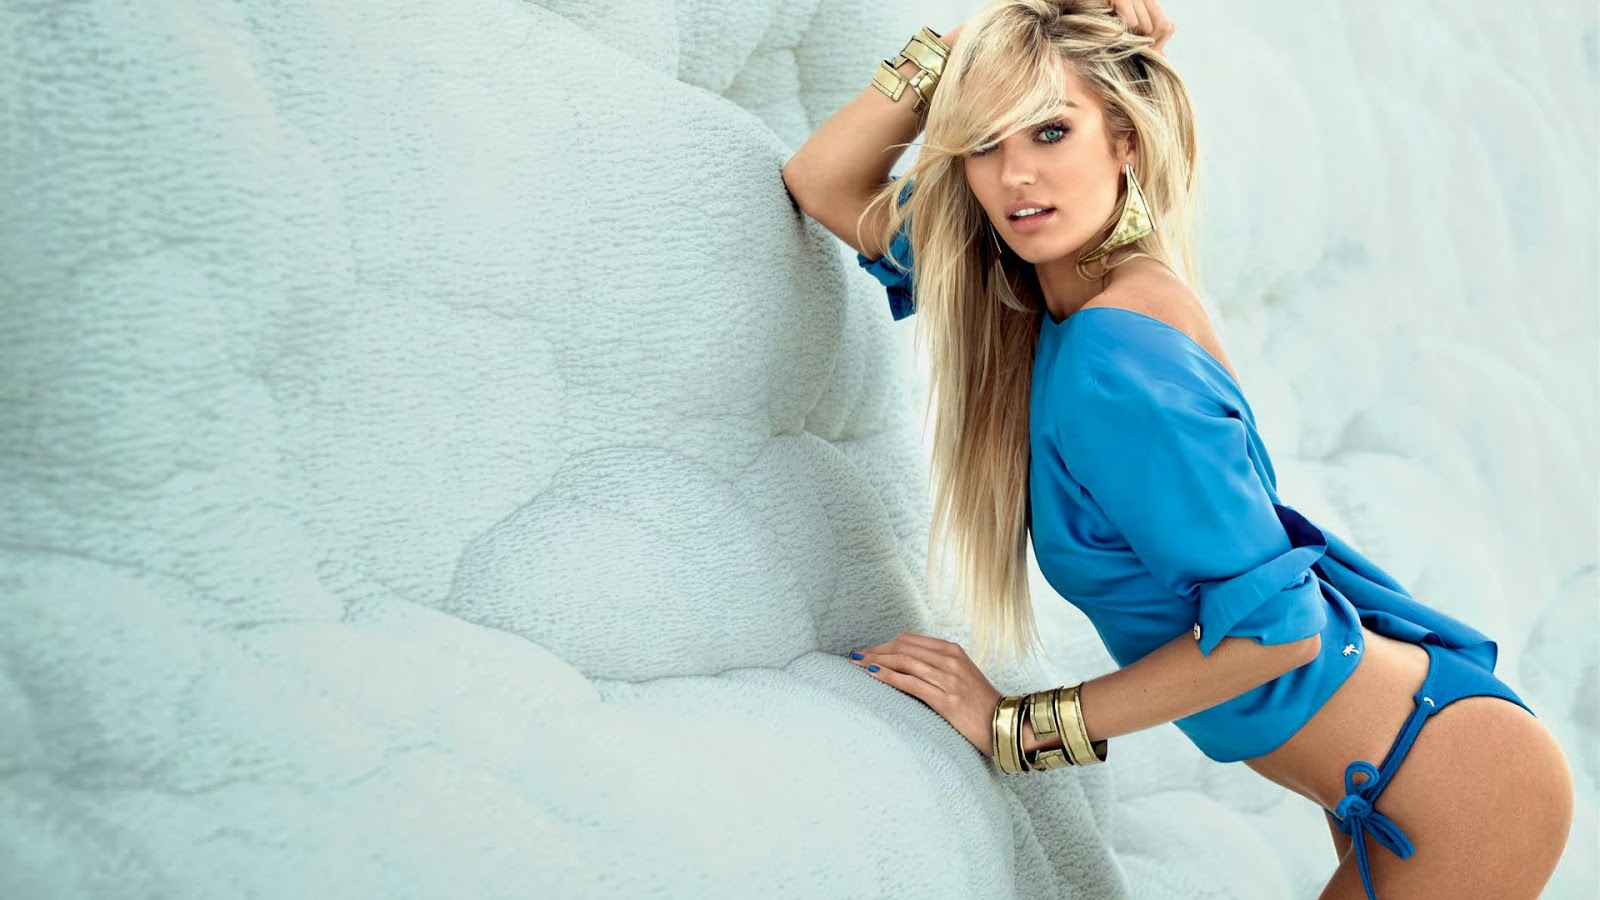 Prabhasmyhero Blog Prabhas Awesome Hd Stills Without: Candice Swanepoel Hot HD Wallpapers